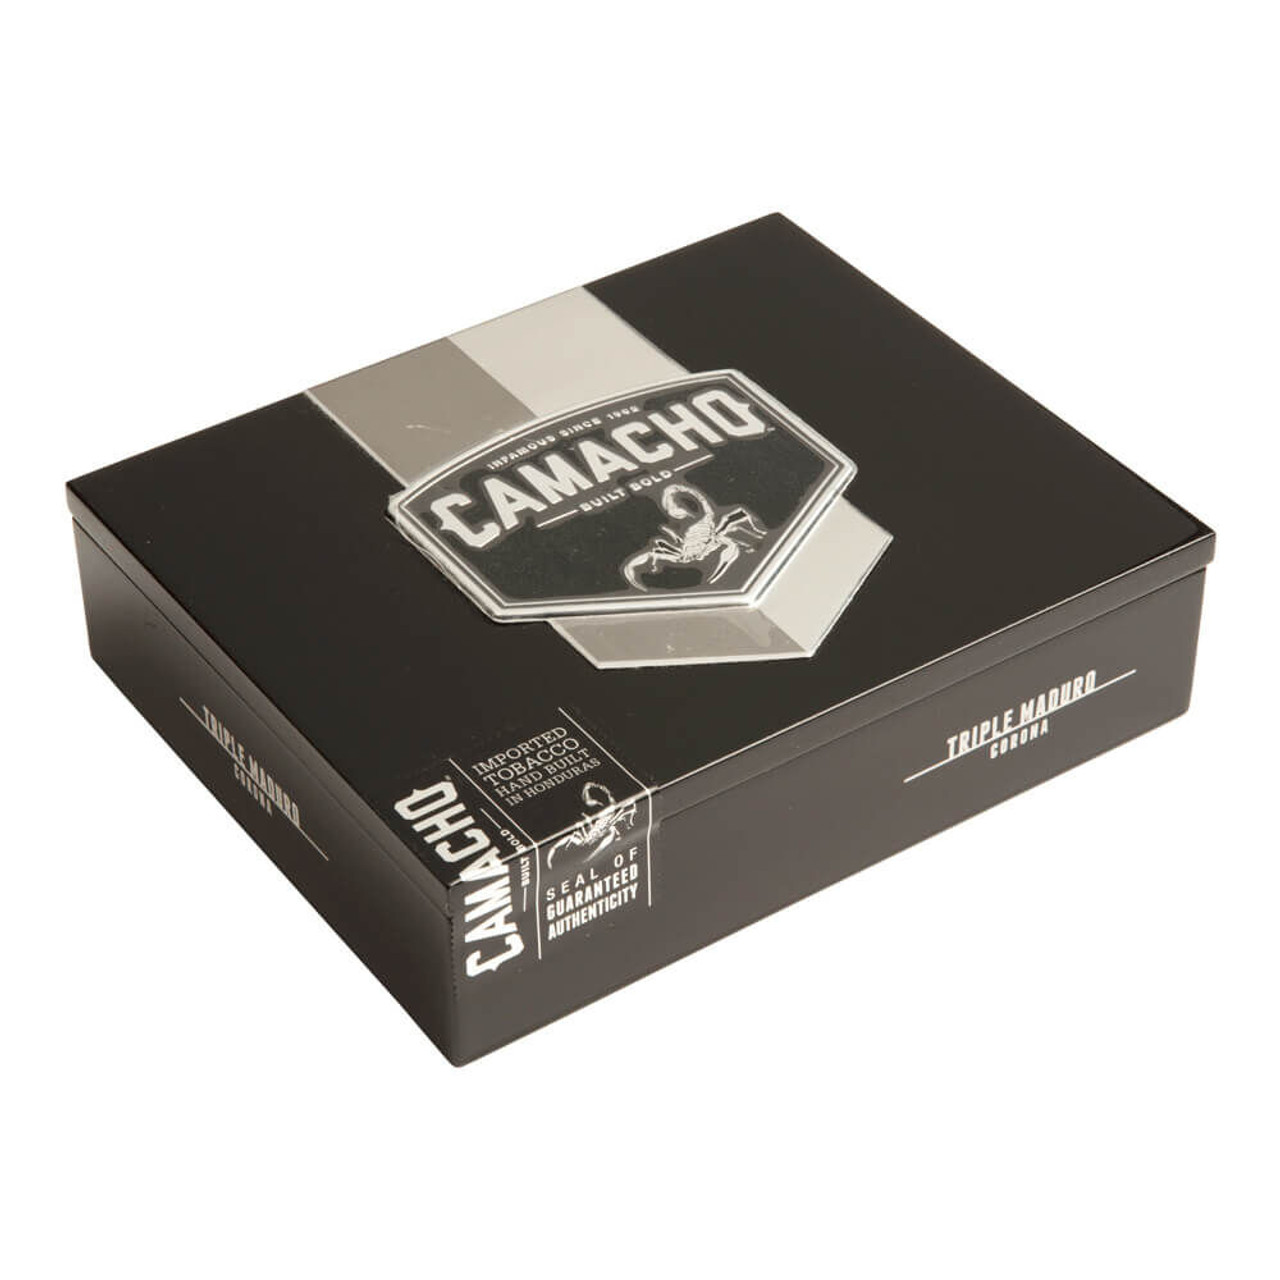 Camacho Triple Maduro Corona Cigars - 5.5 x 44 (Box of 20)